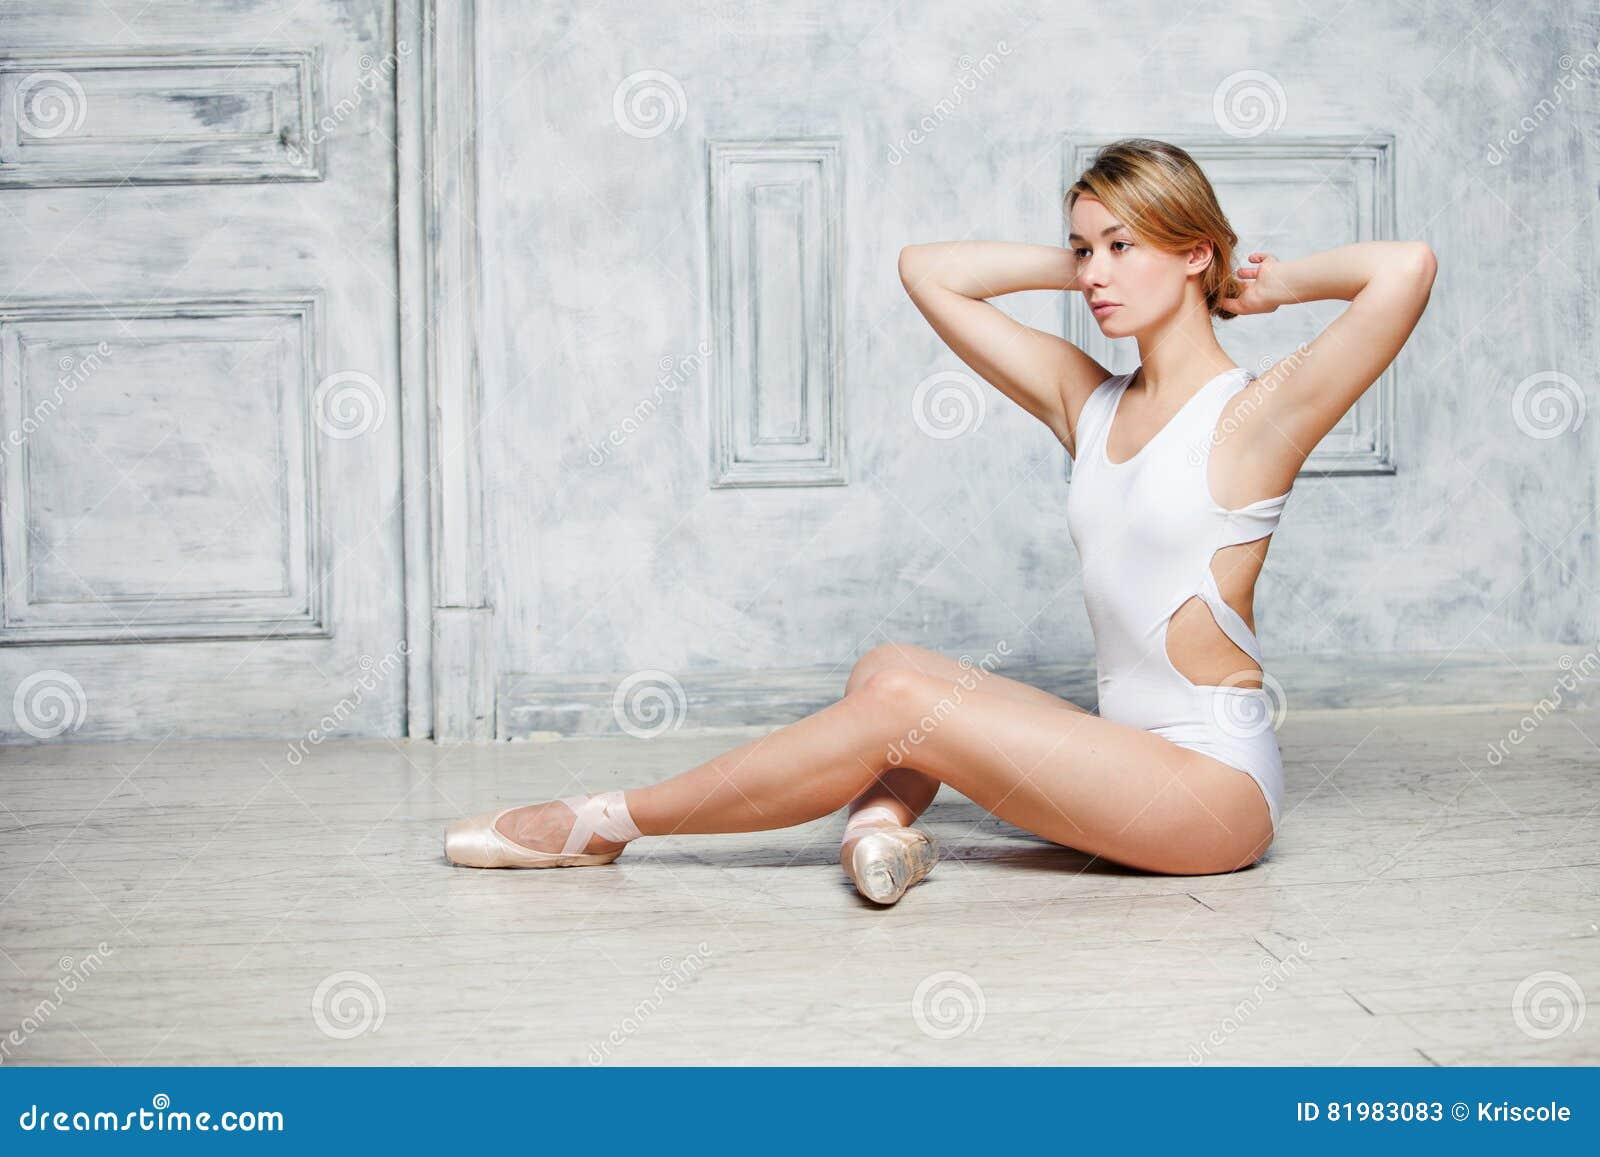 sexy girls period movies